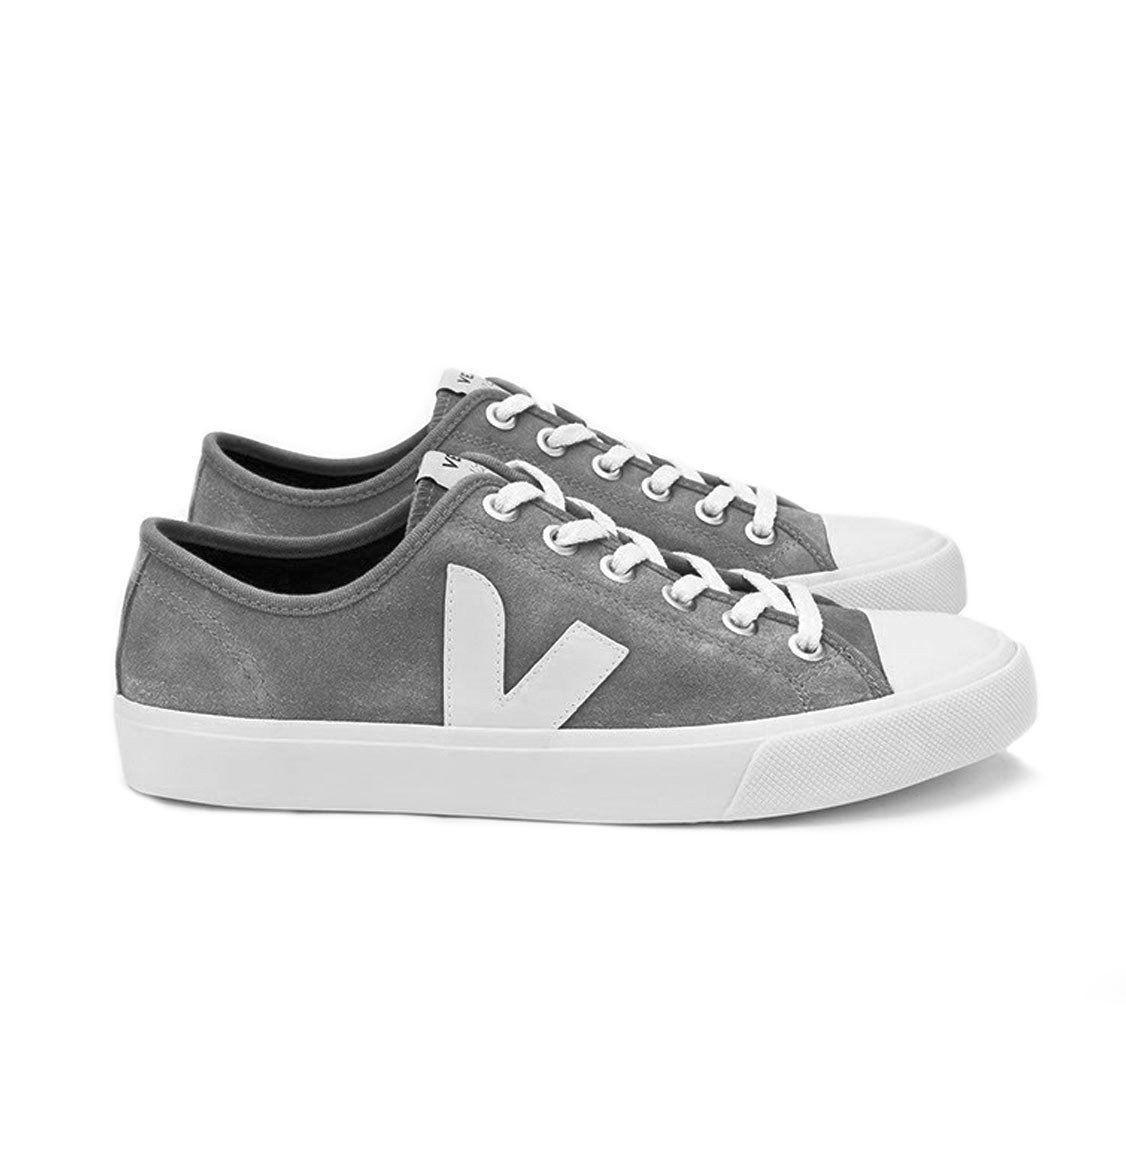 Wata sneakers - Grey Veja Best Online tp81Ia